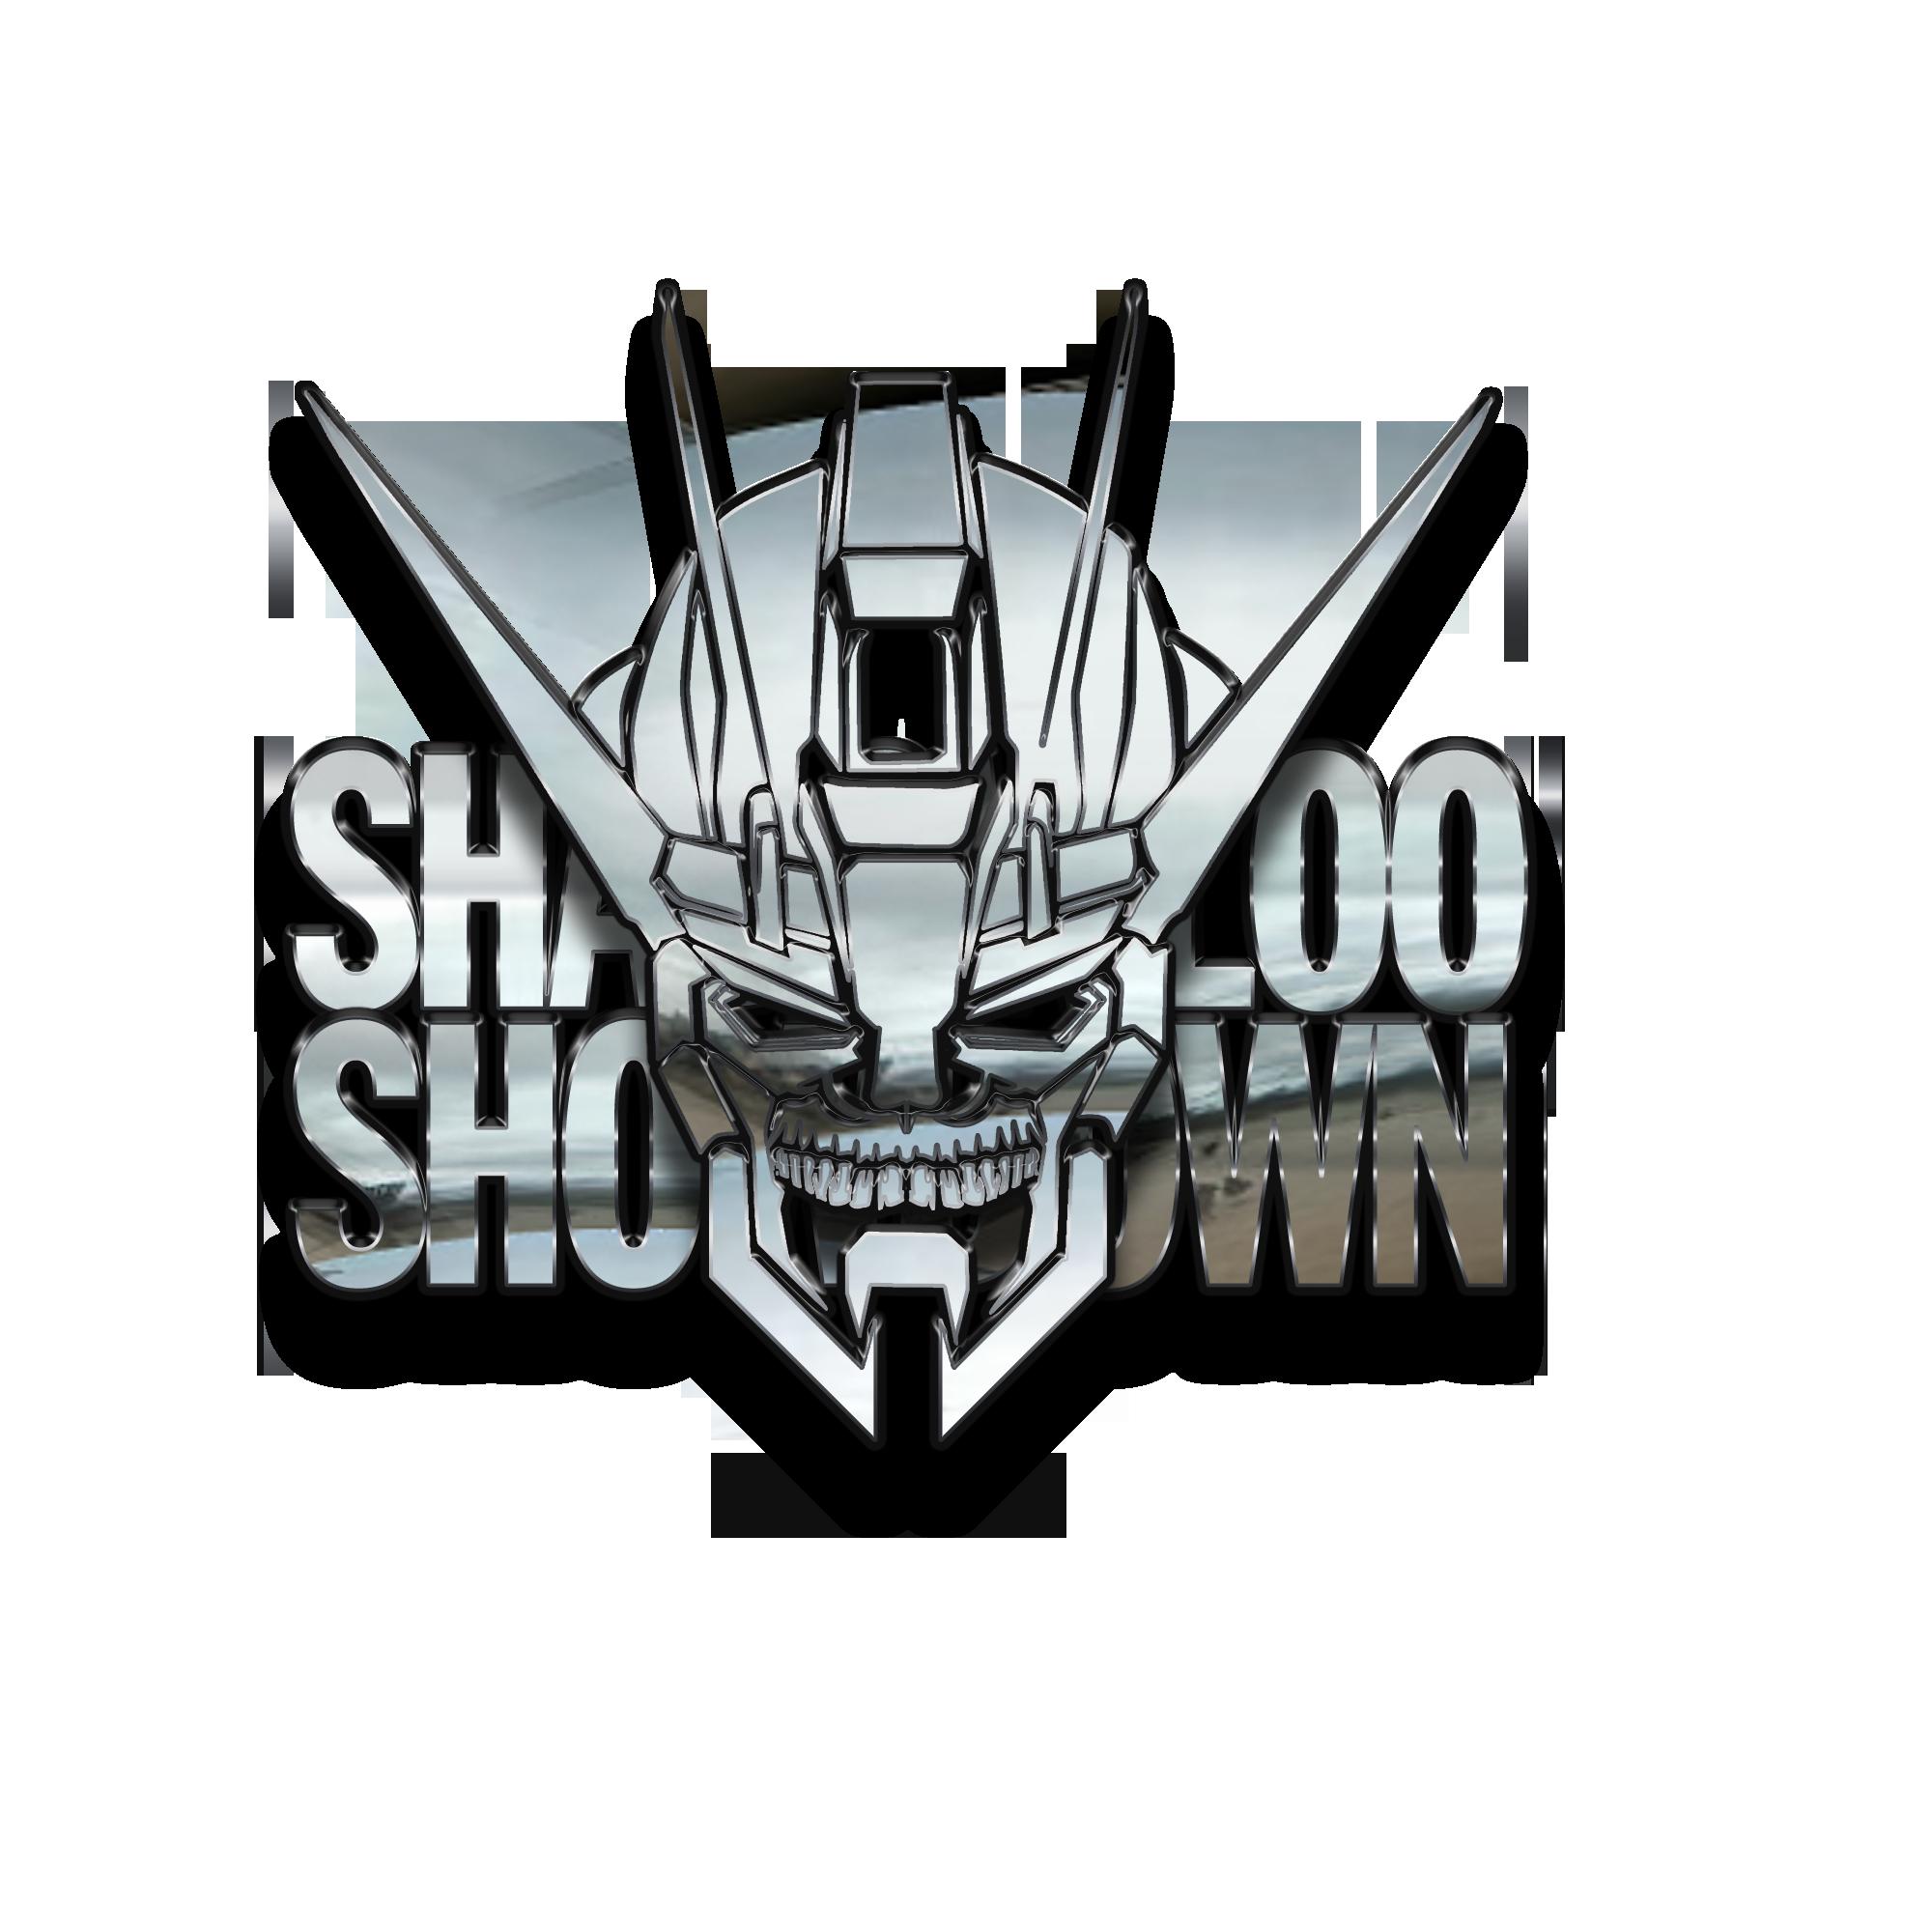 Shadowloo Showdown x World Game Cup